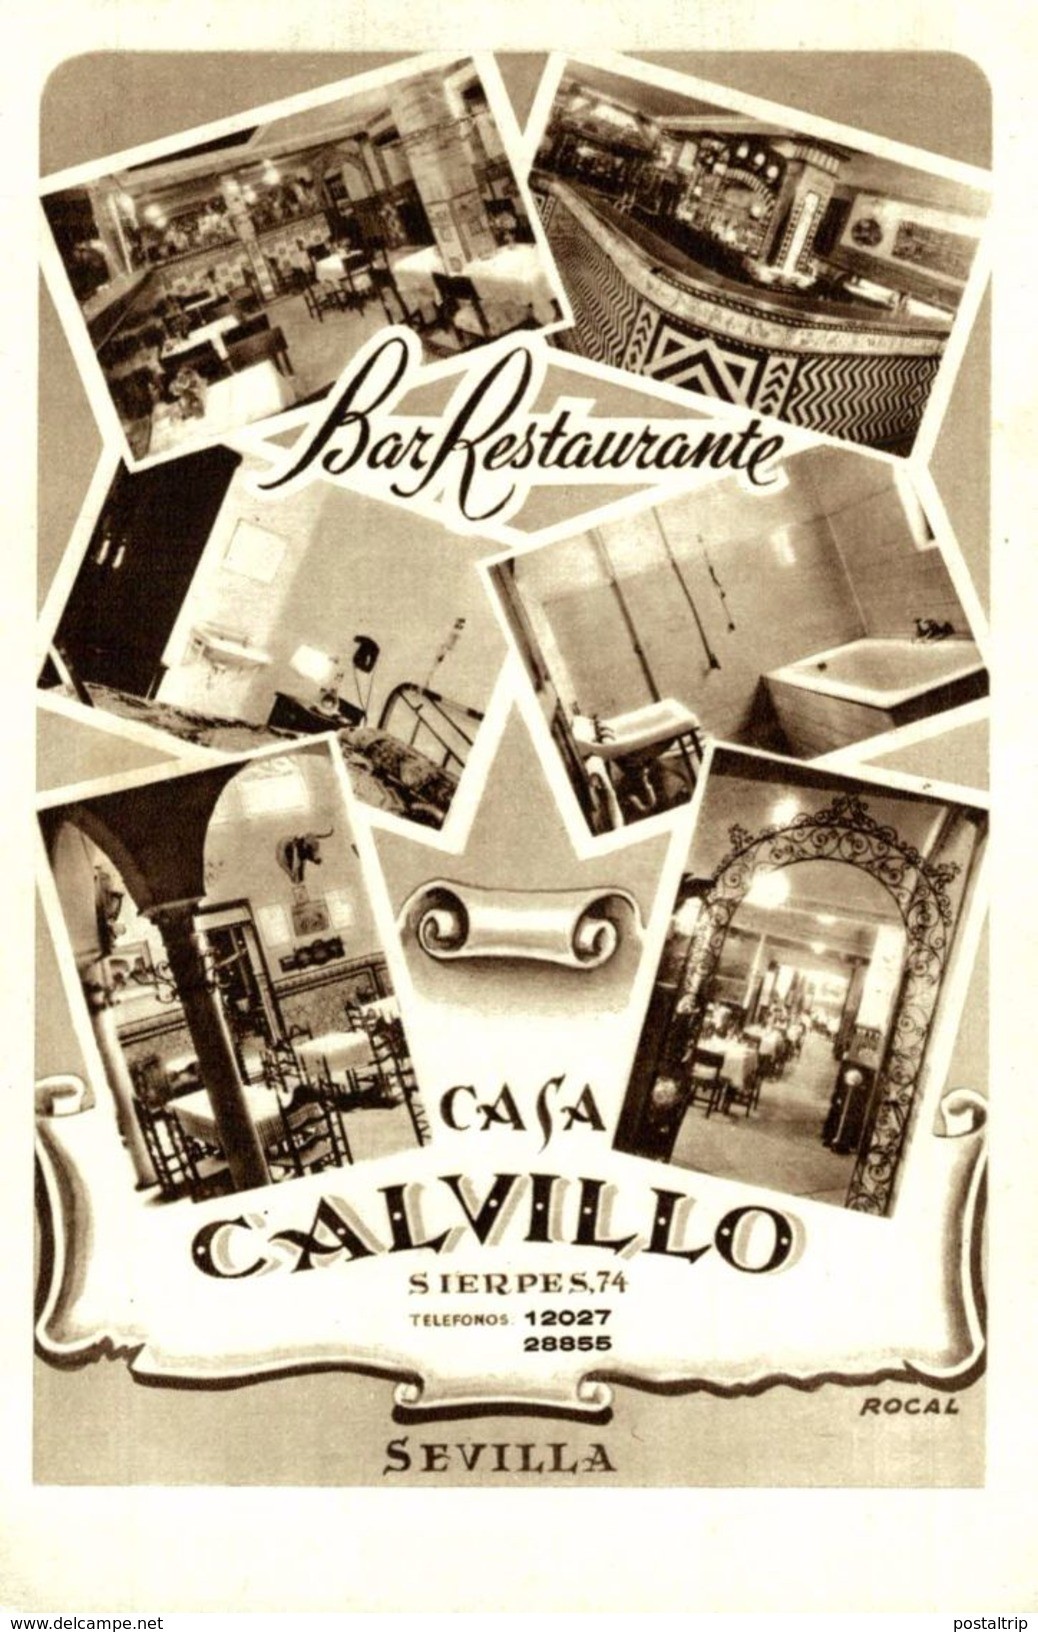 SEVILLA. BAR RESTAURANTE CASA CALVILLO - Sevilla